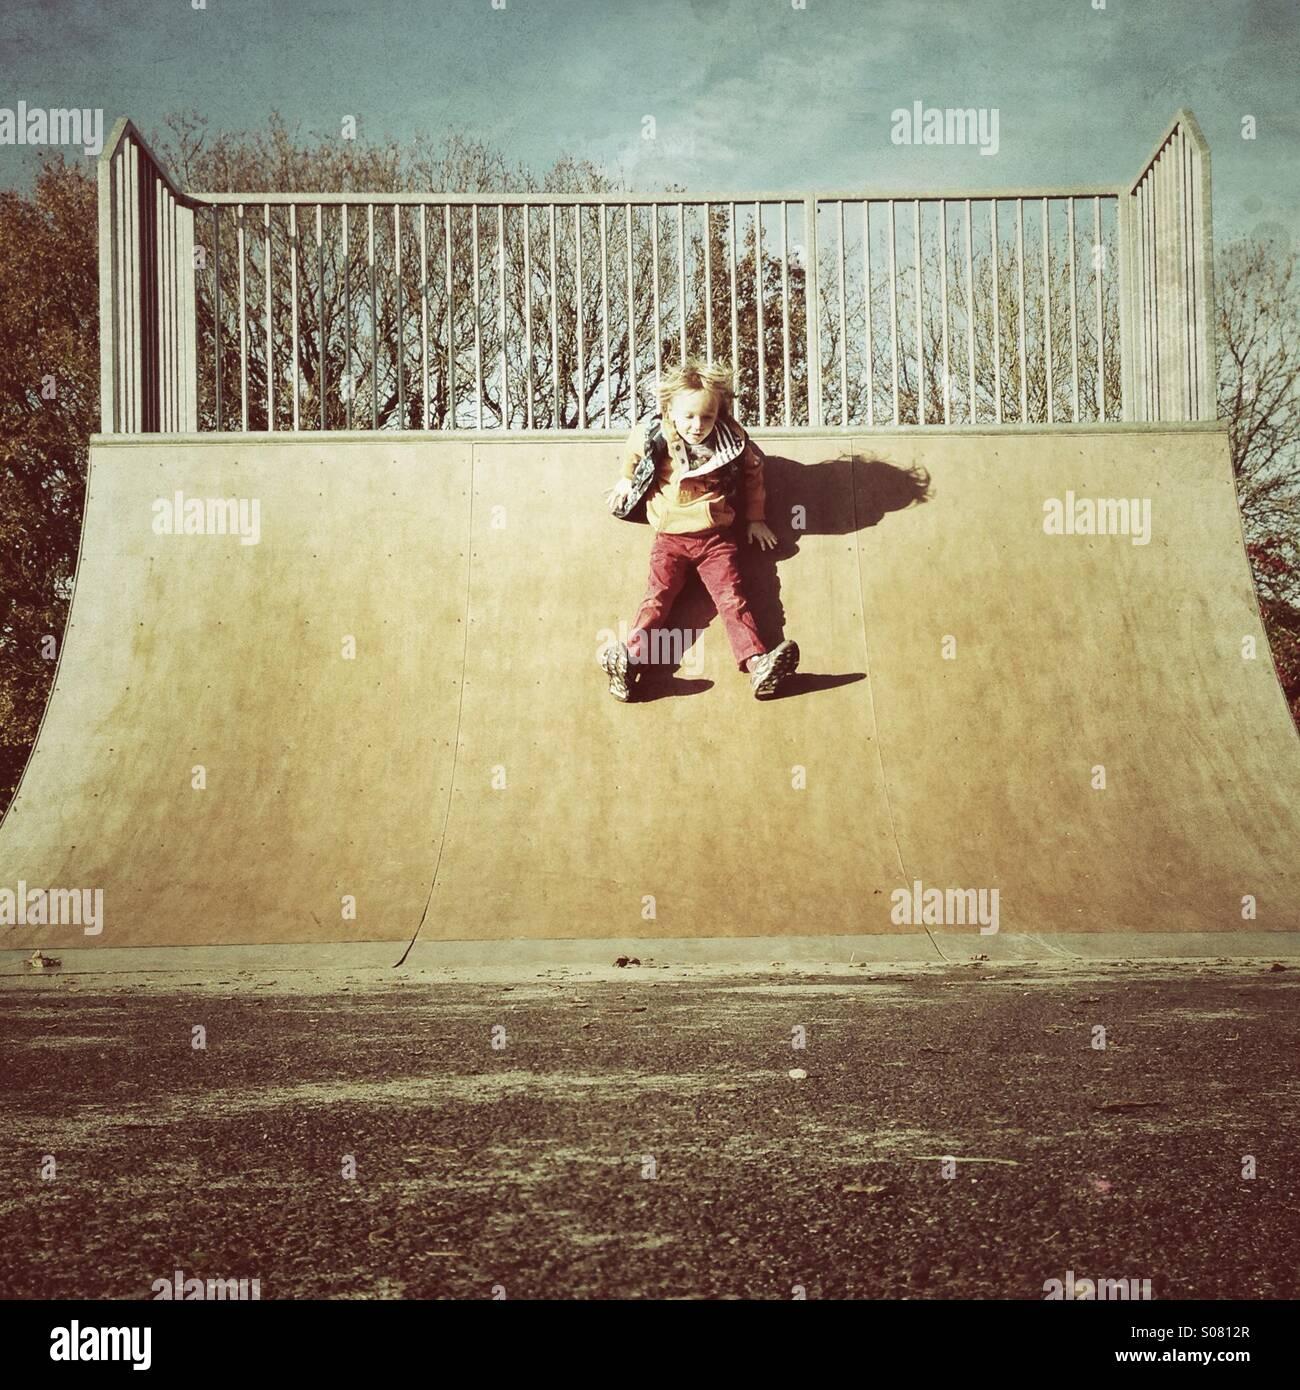 Sliding down a skate ramp - Stock Image